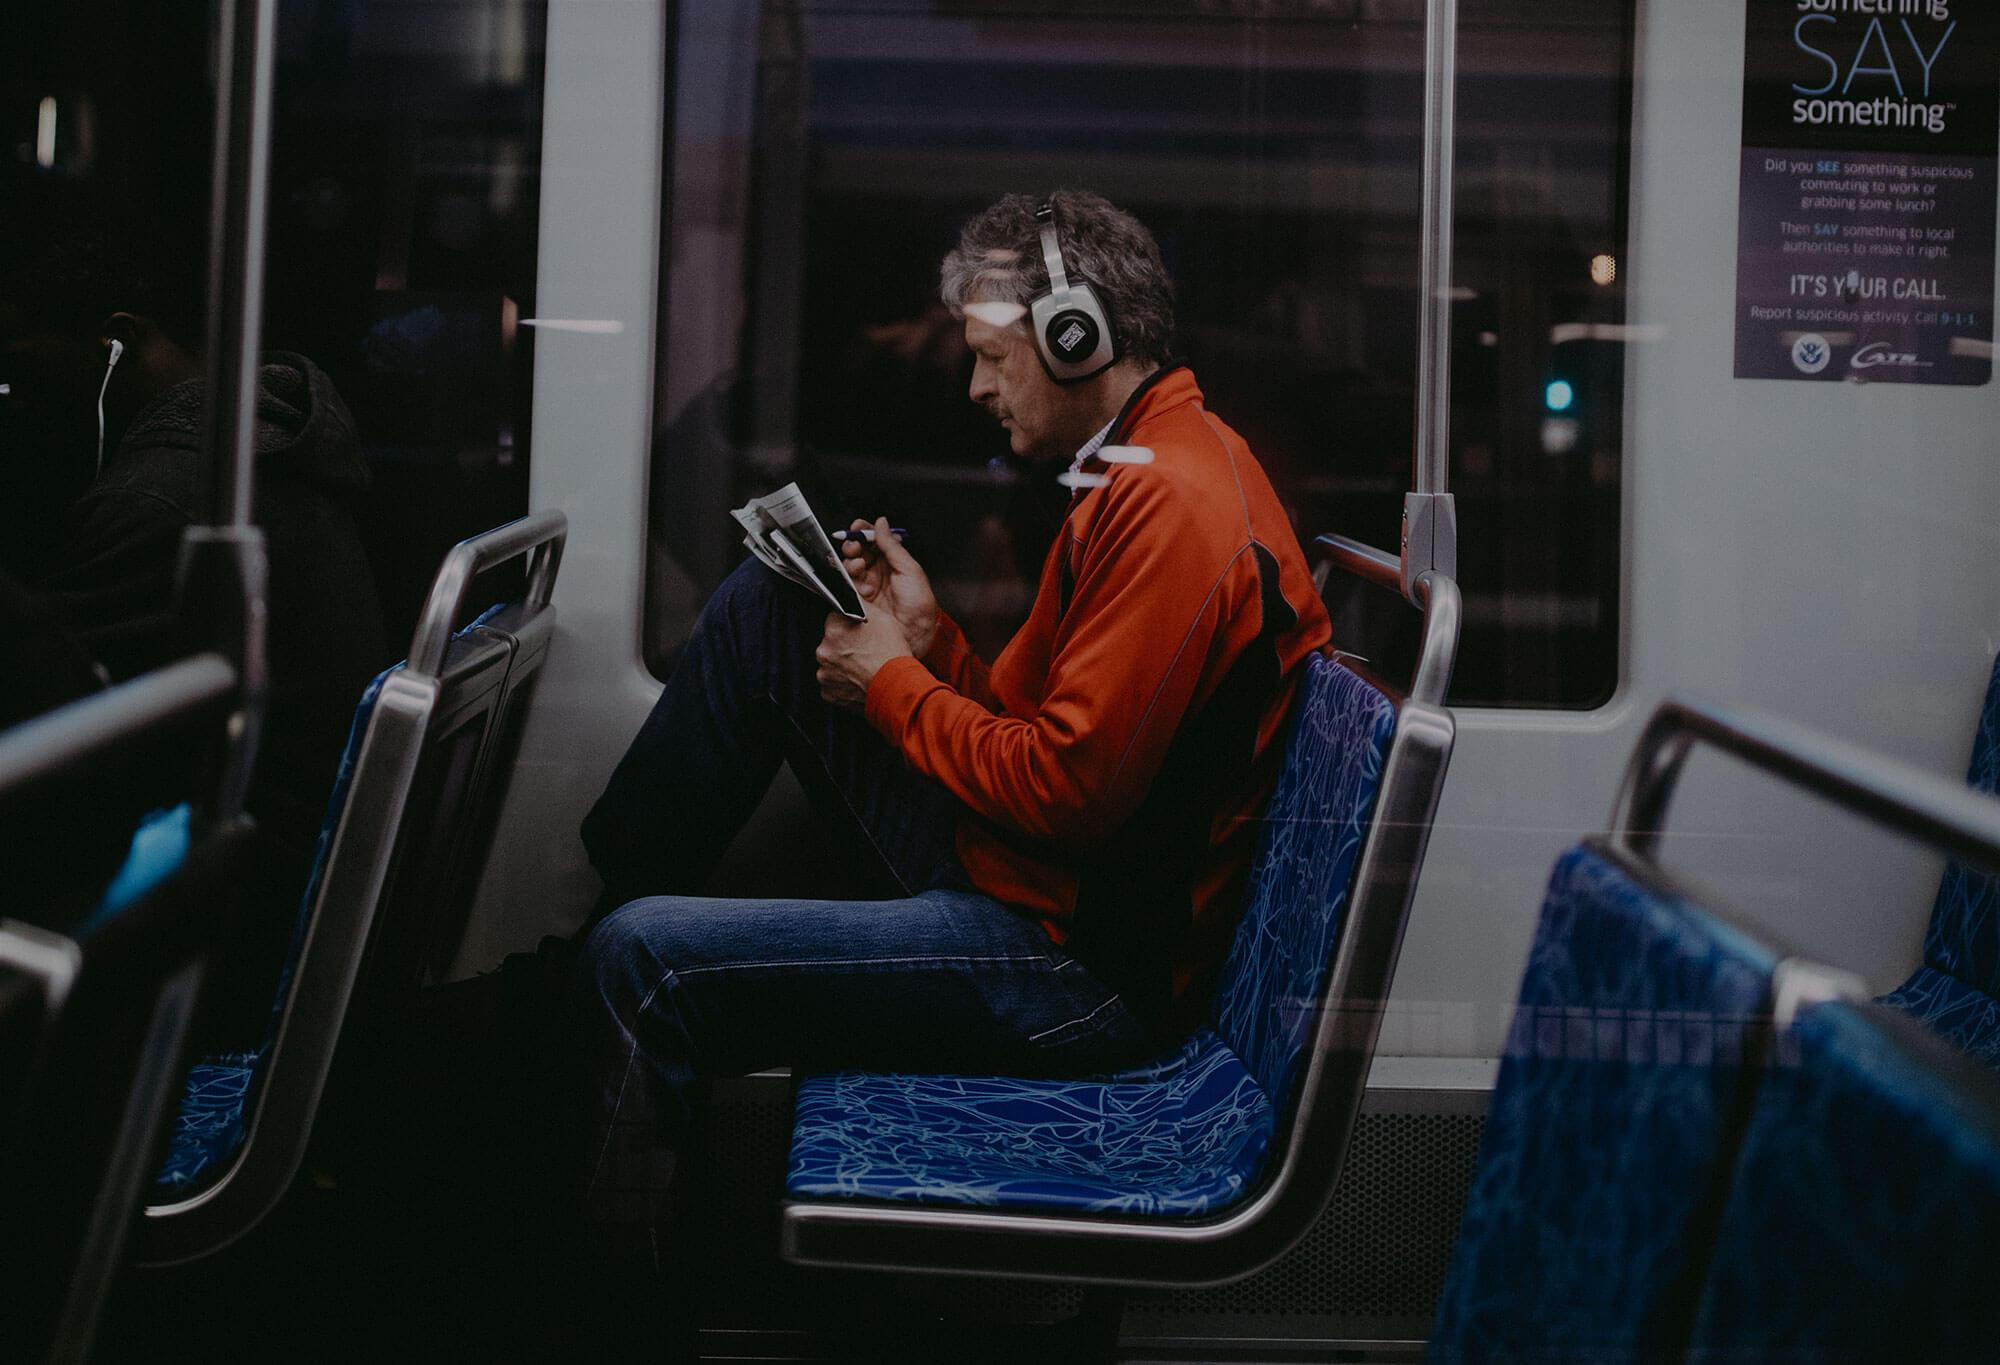 Pole emploi - offre emploi Chauffeur d'autobus (H/F) - Berson